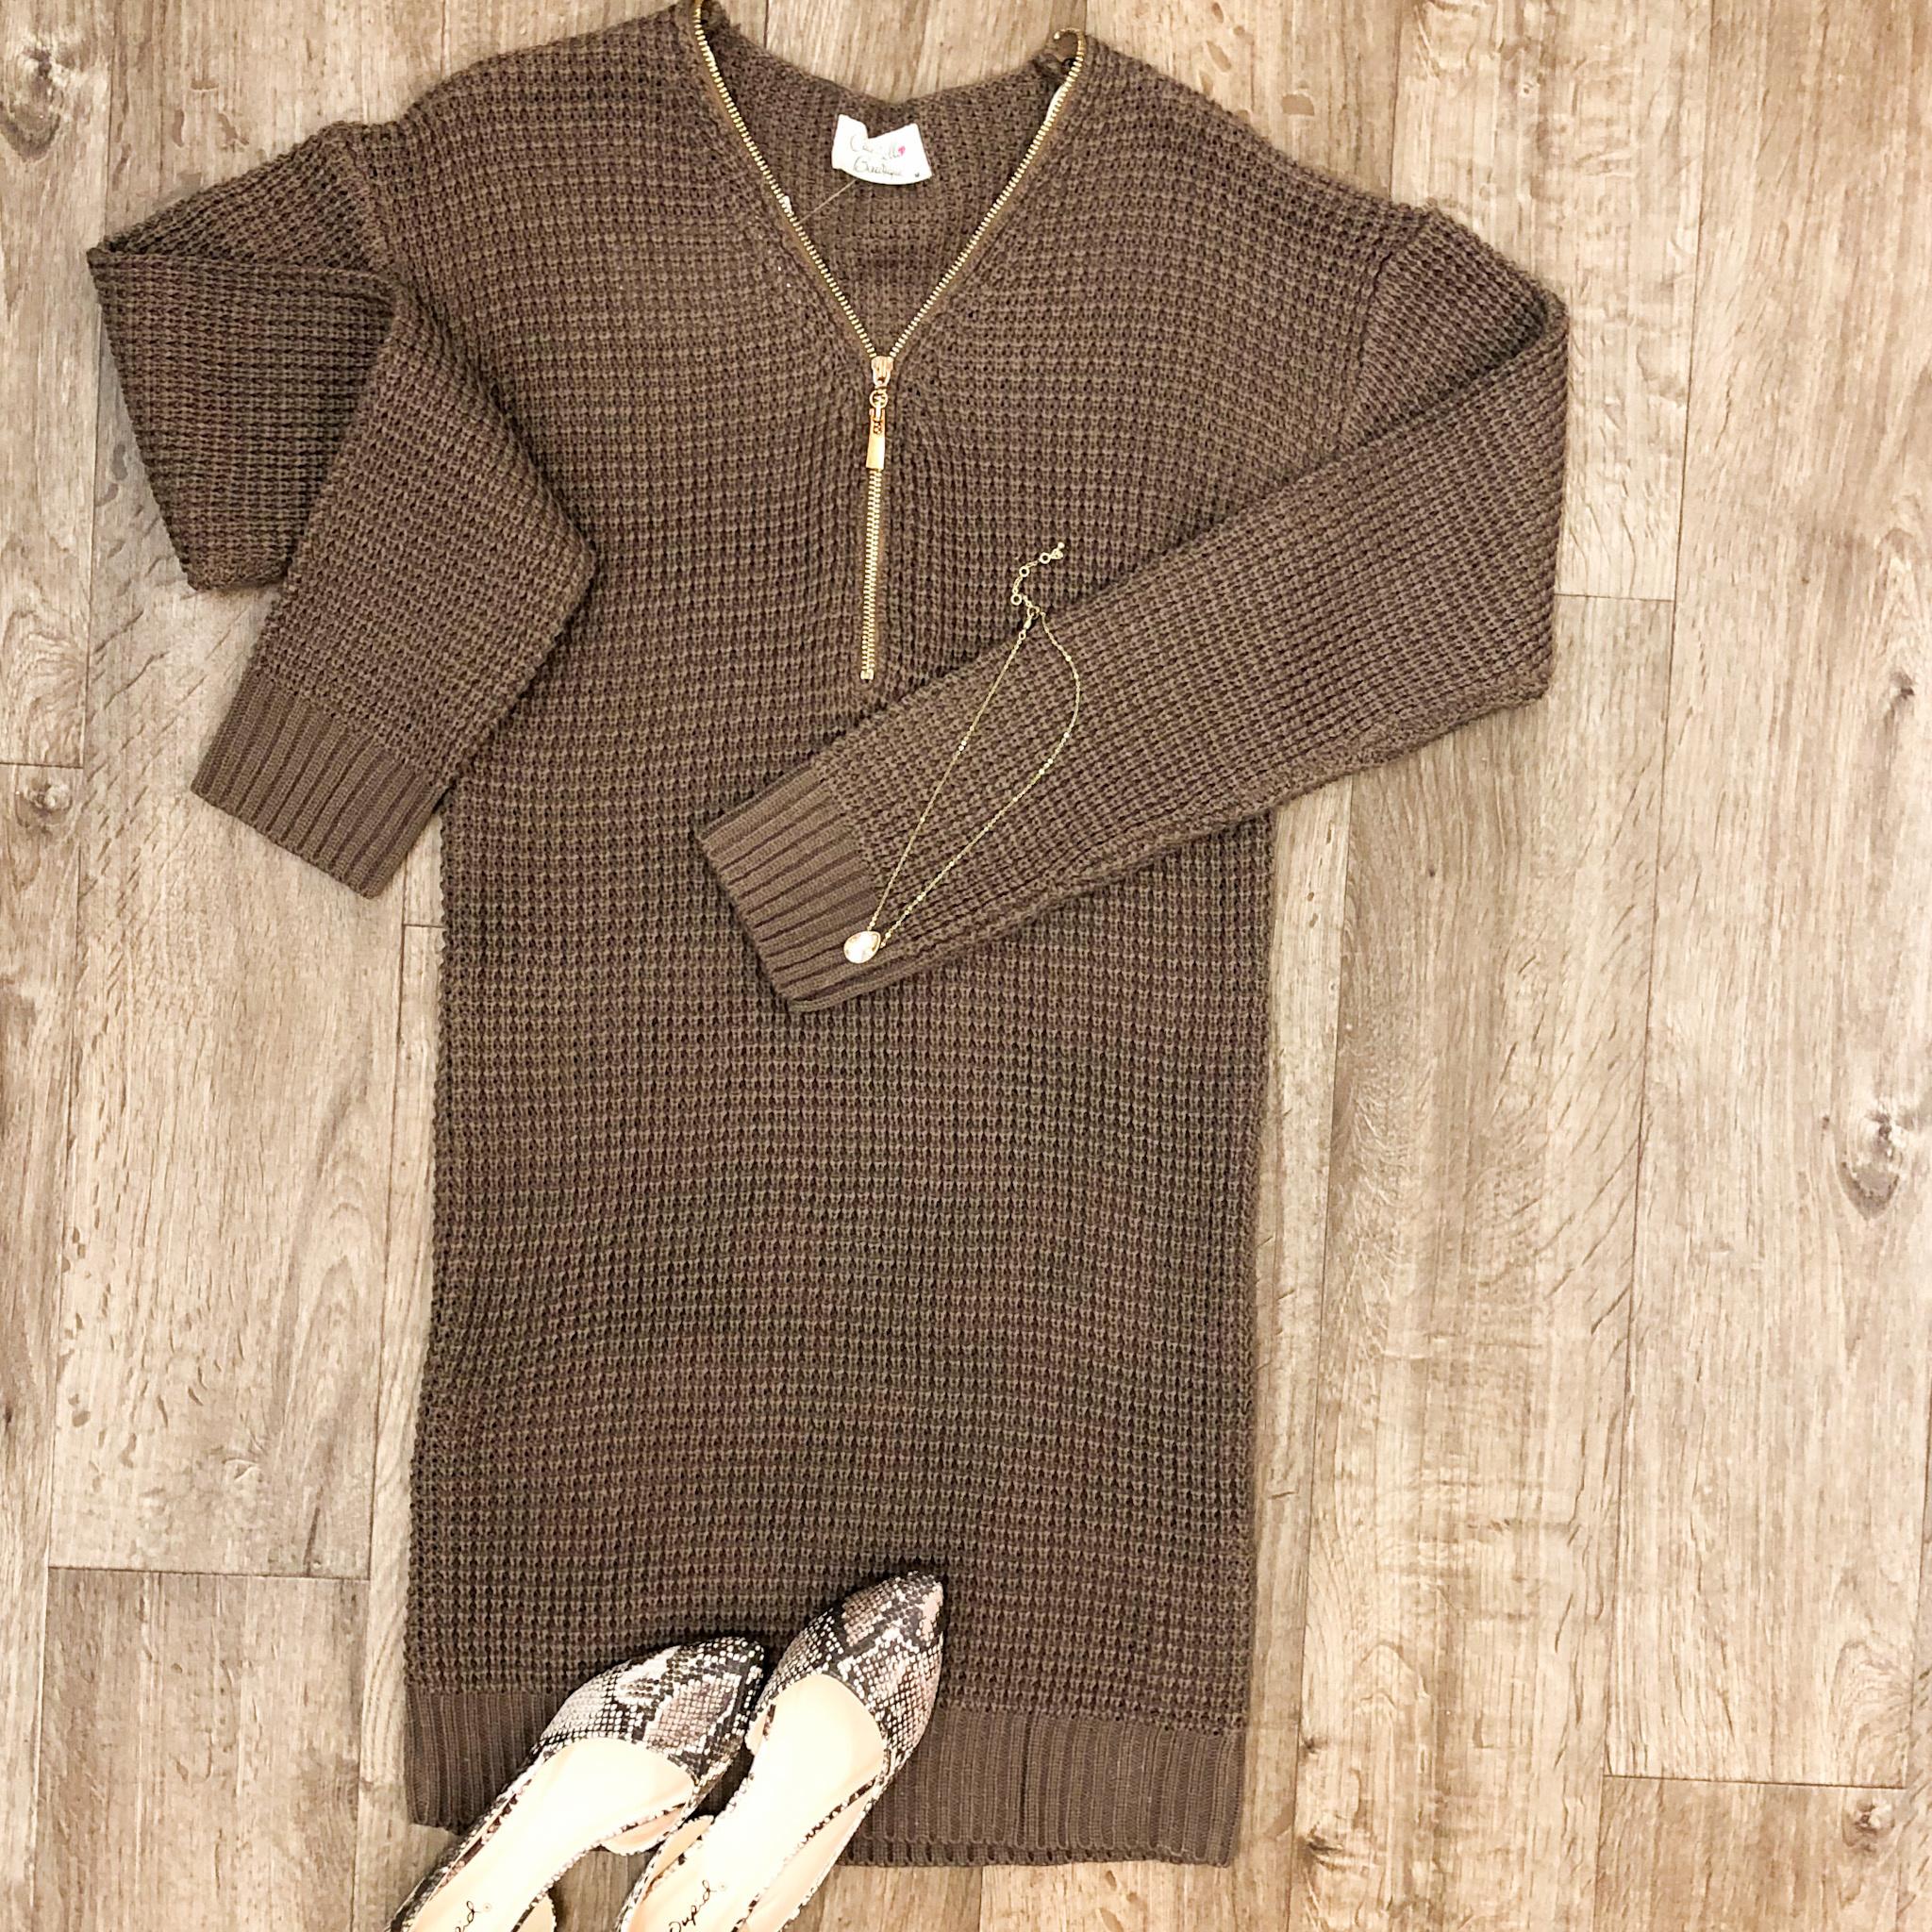 Knitted & Zipped Sweater Dress